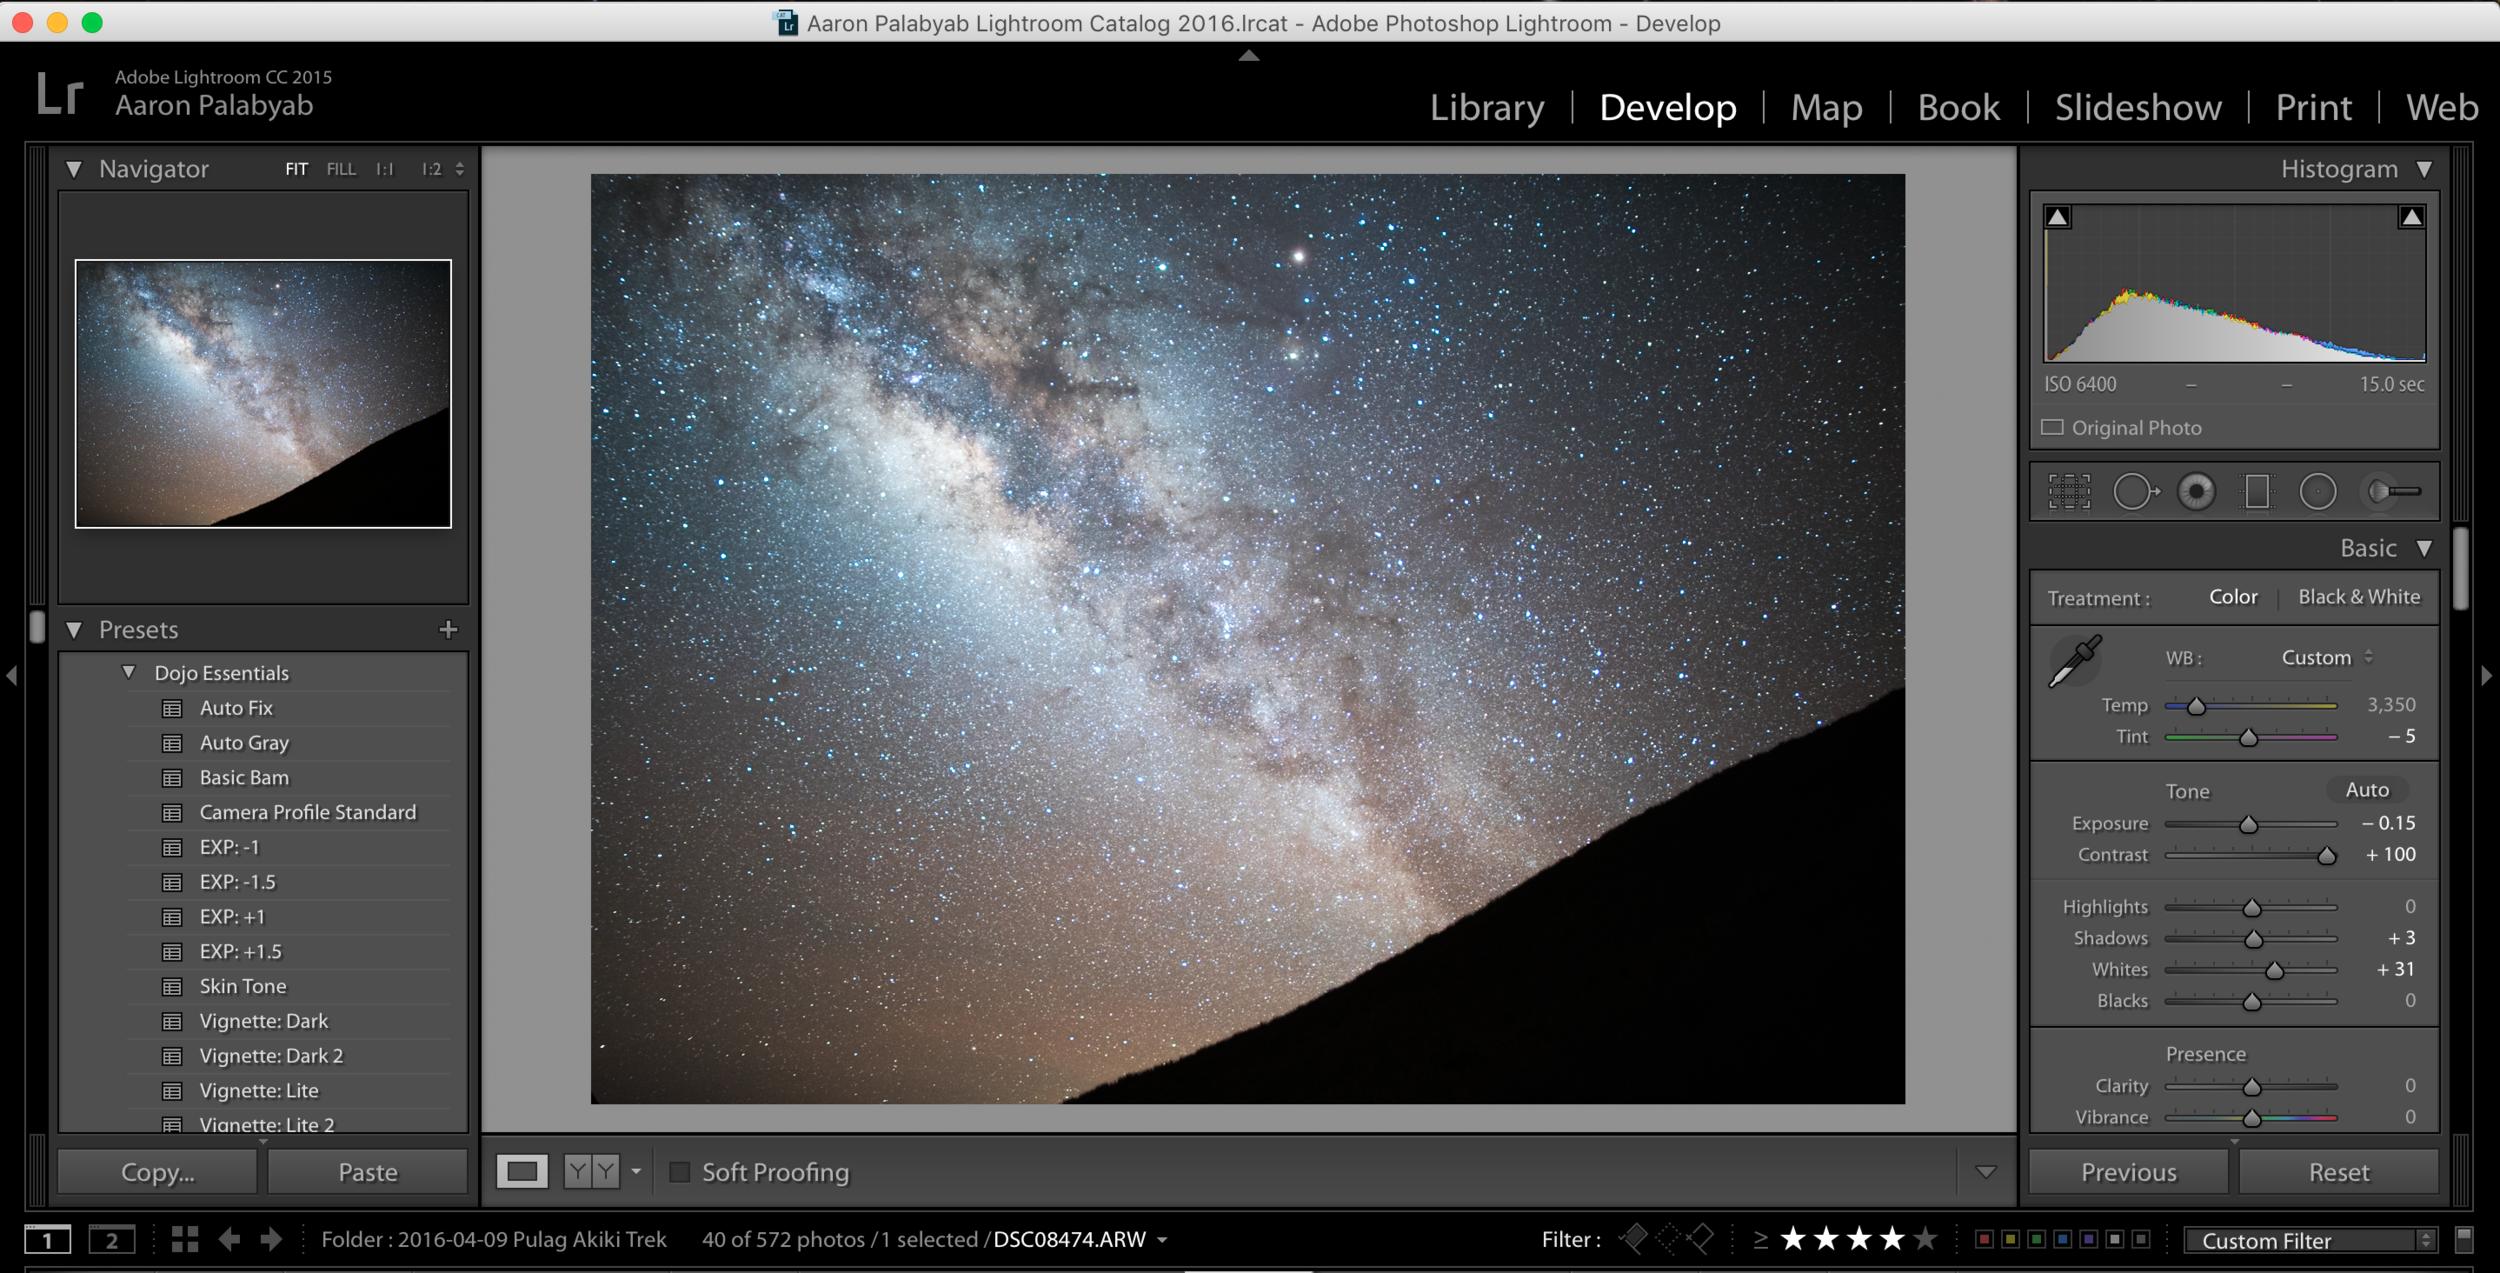 Processing a RAW image using Adobe Photoshop Lightroom CC